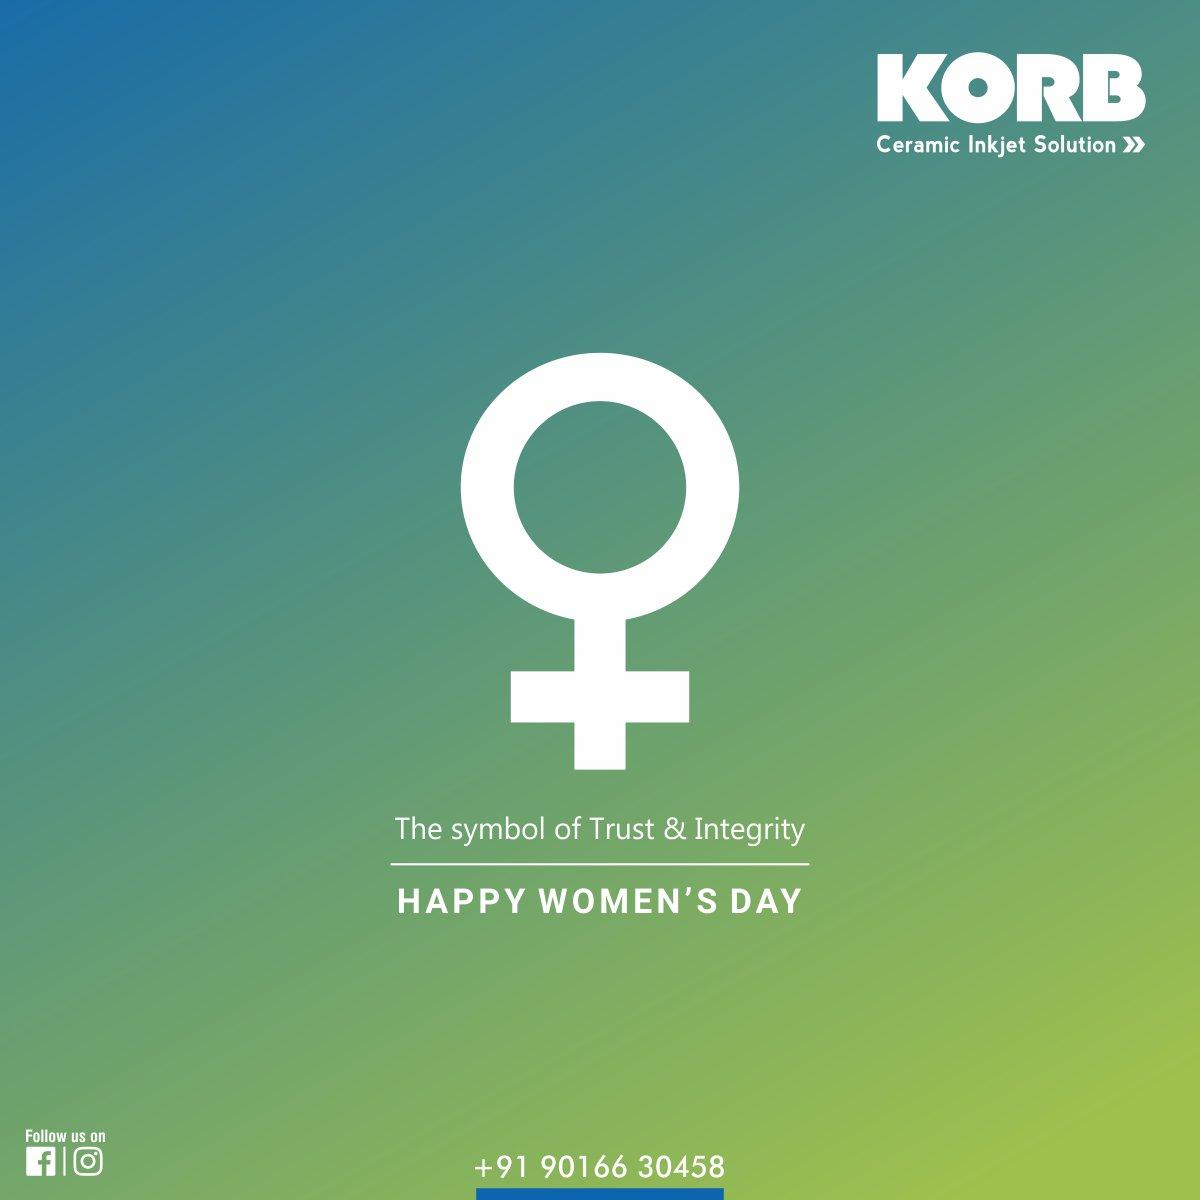 Korb Ceramic Inkjet Solution On Twitter Happy Womens Day The